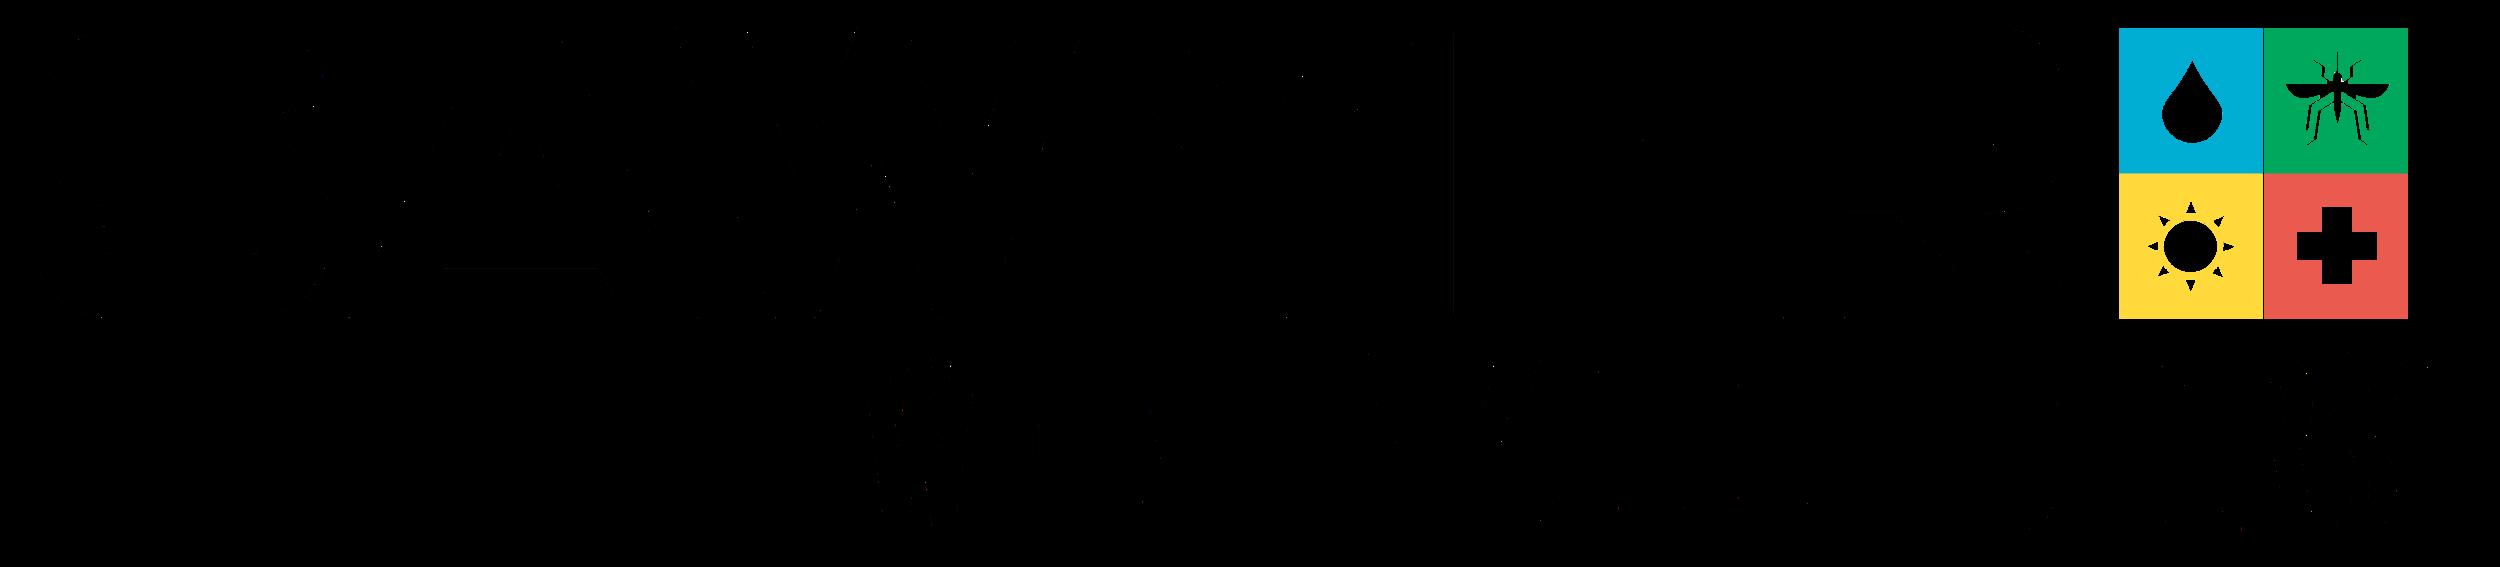 Sawyer WKYO logo 2018 color.png